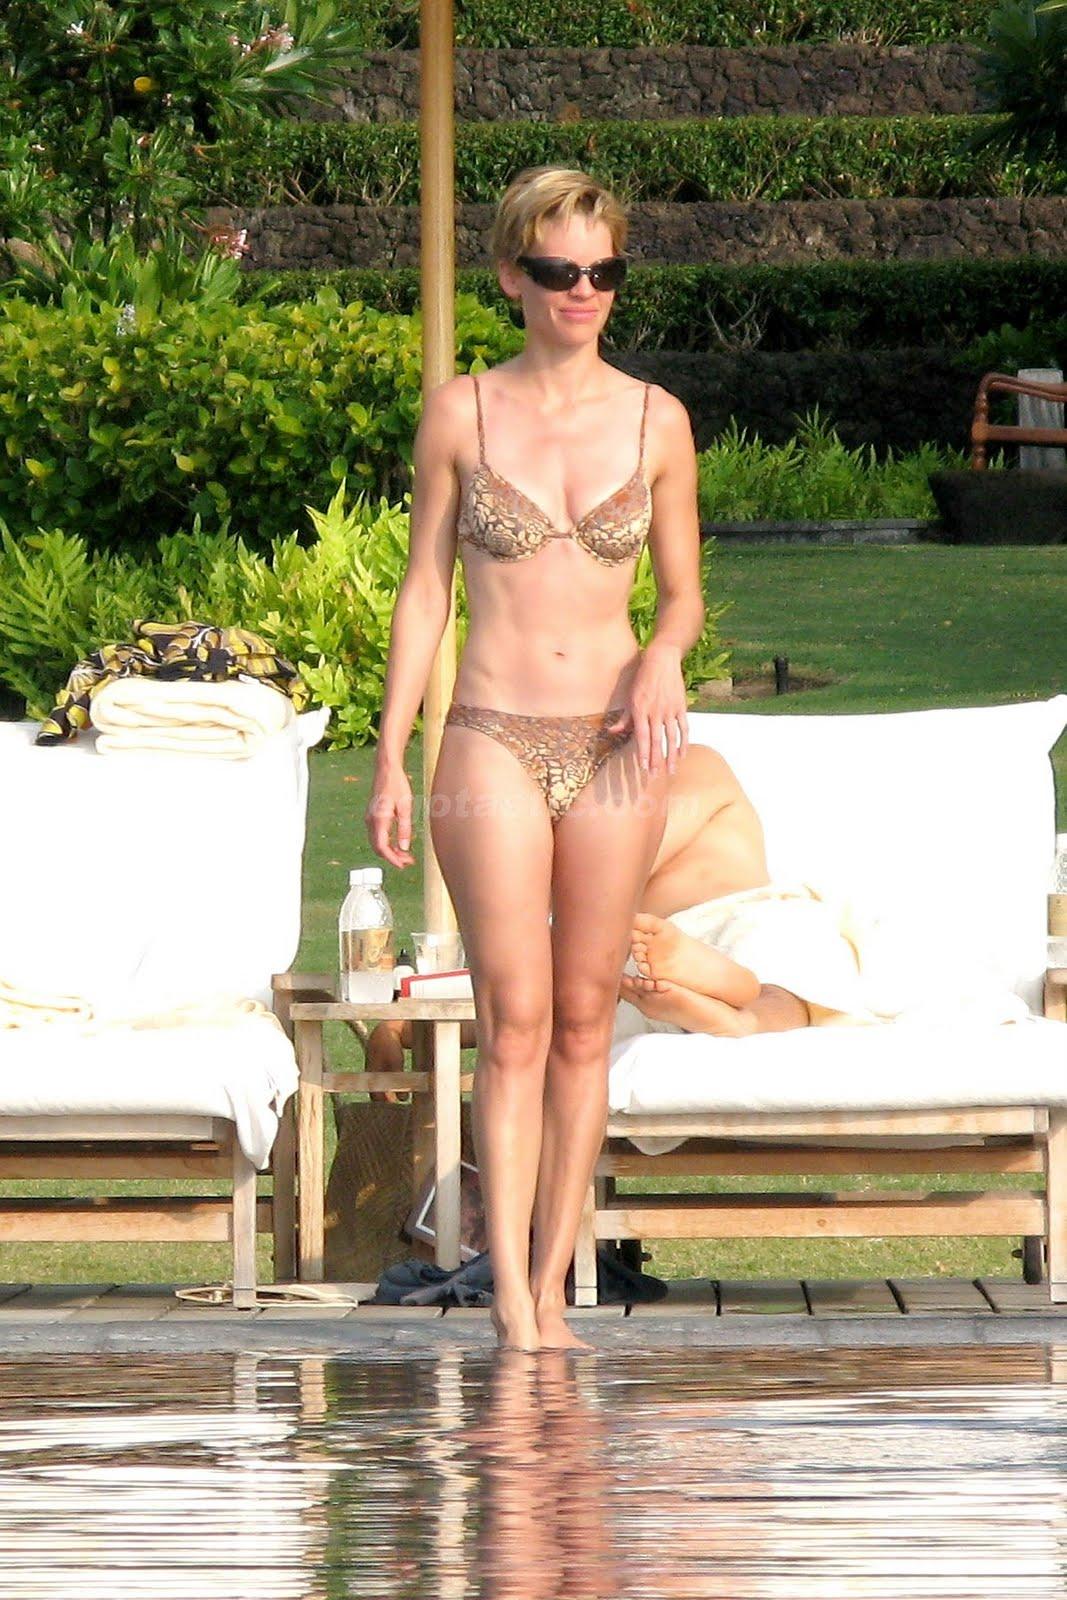 http://1.bp.blogspot.com/_3G4dg-GWVKI/TJNNYtRNi3I/AAAAAAAAIAI/nnswSLHxrek/s1600/12179_hilary-swank-bikini-1-17_123_172lo.jpg